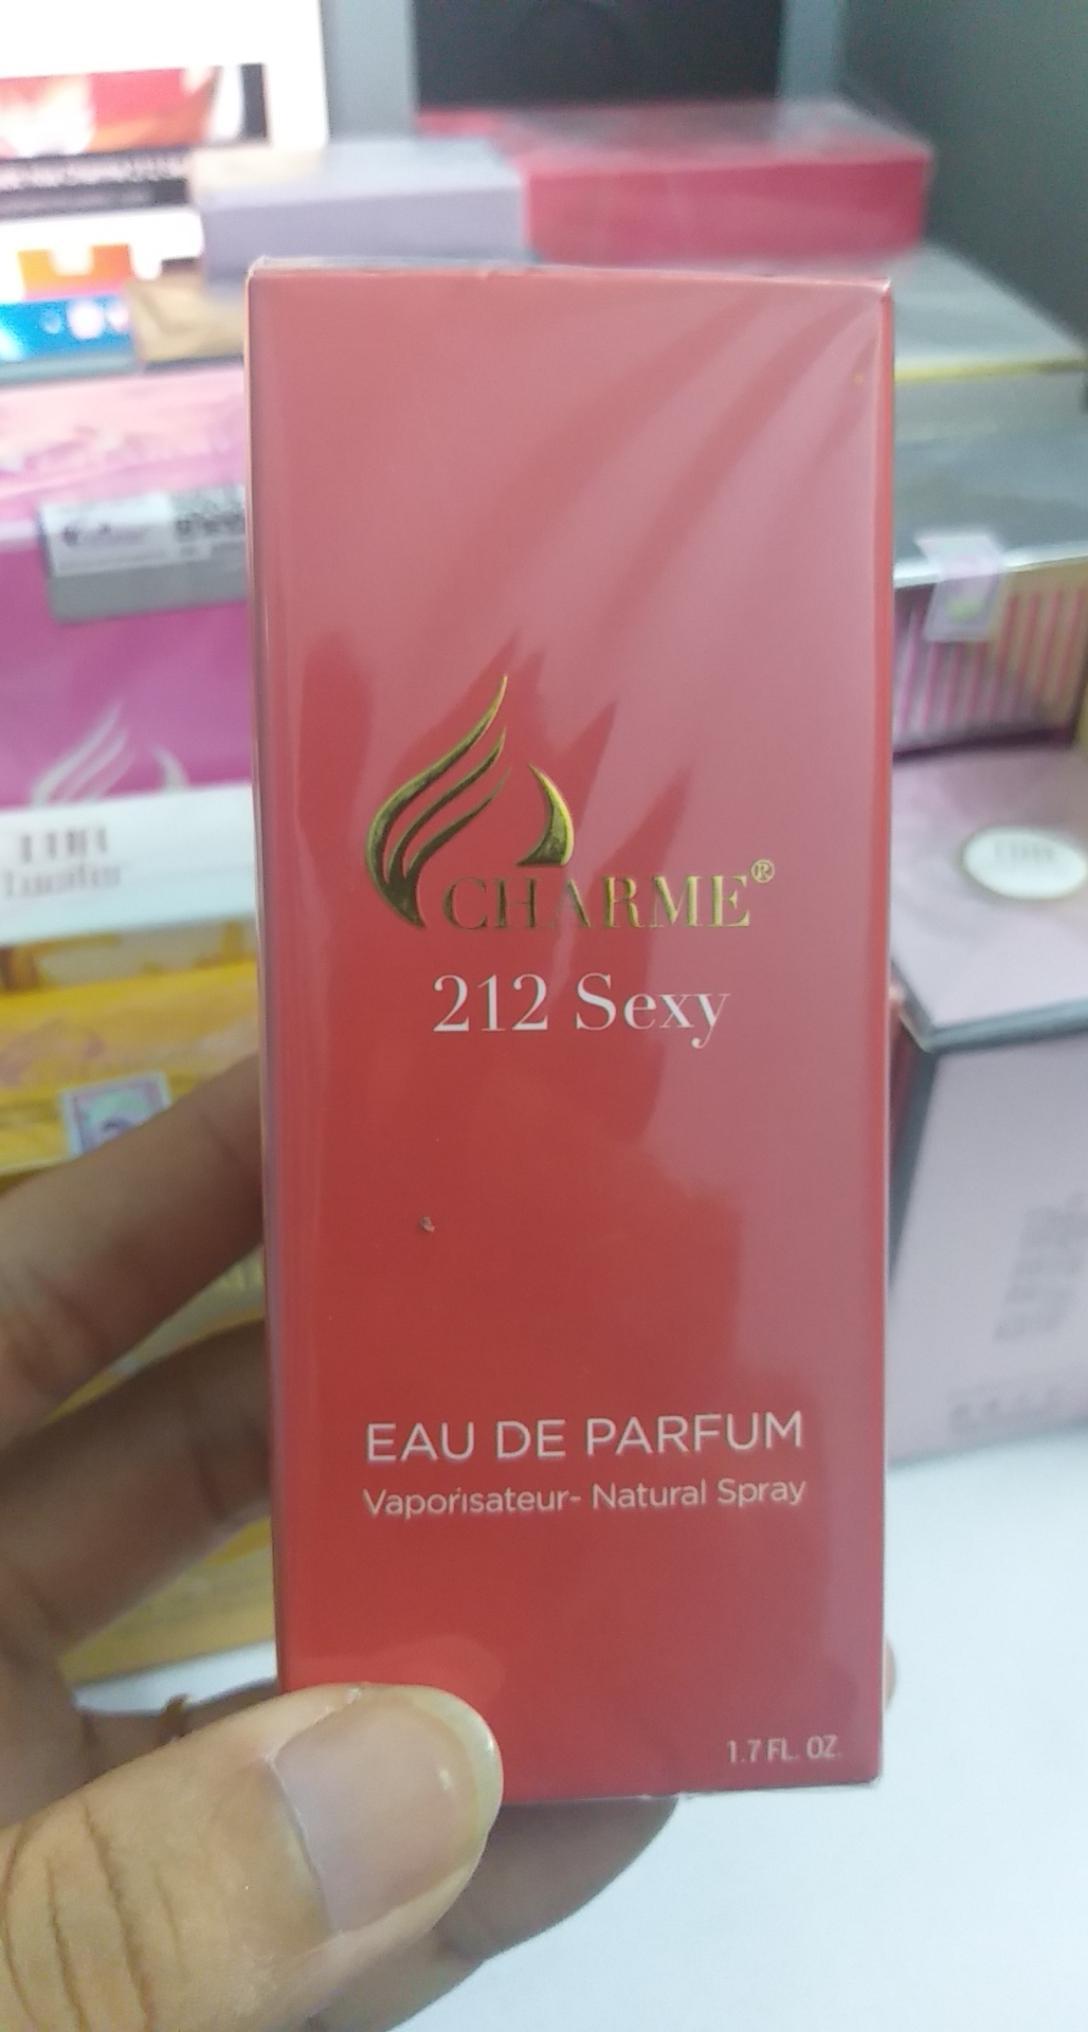 Nước Hoa Unisex Charme 212 Sexy 50ml